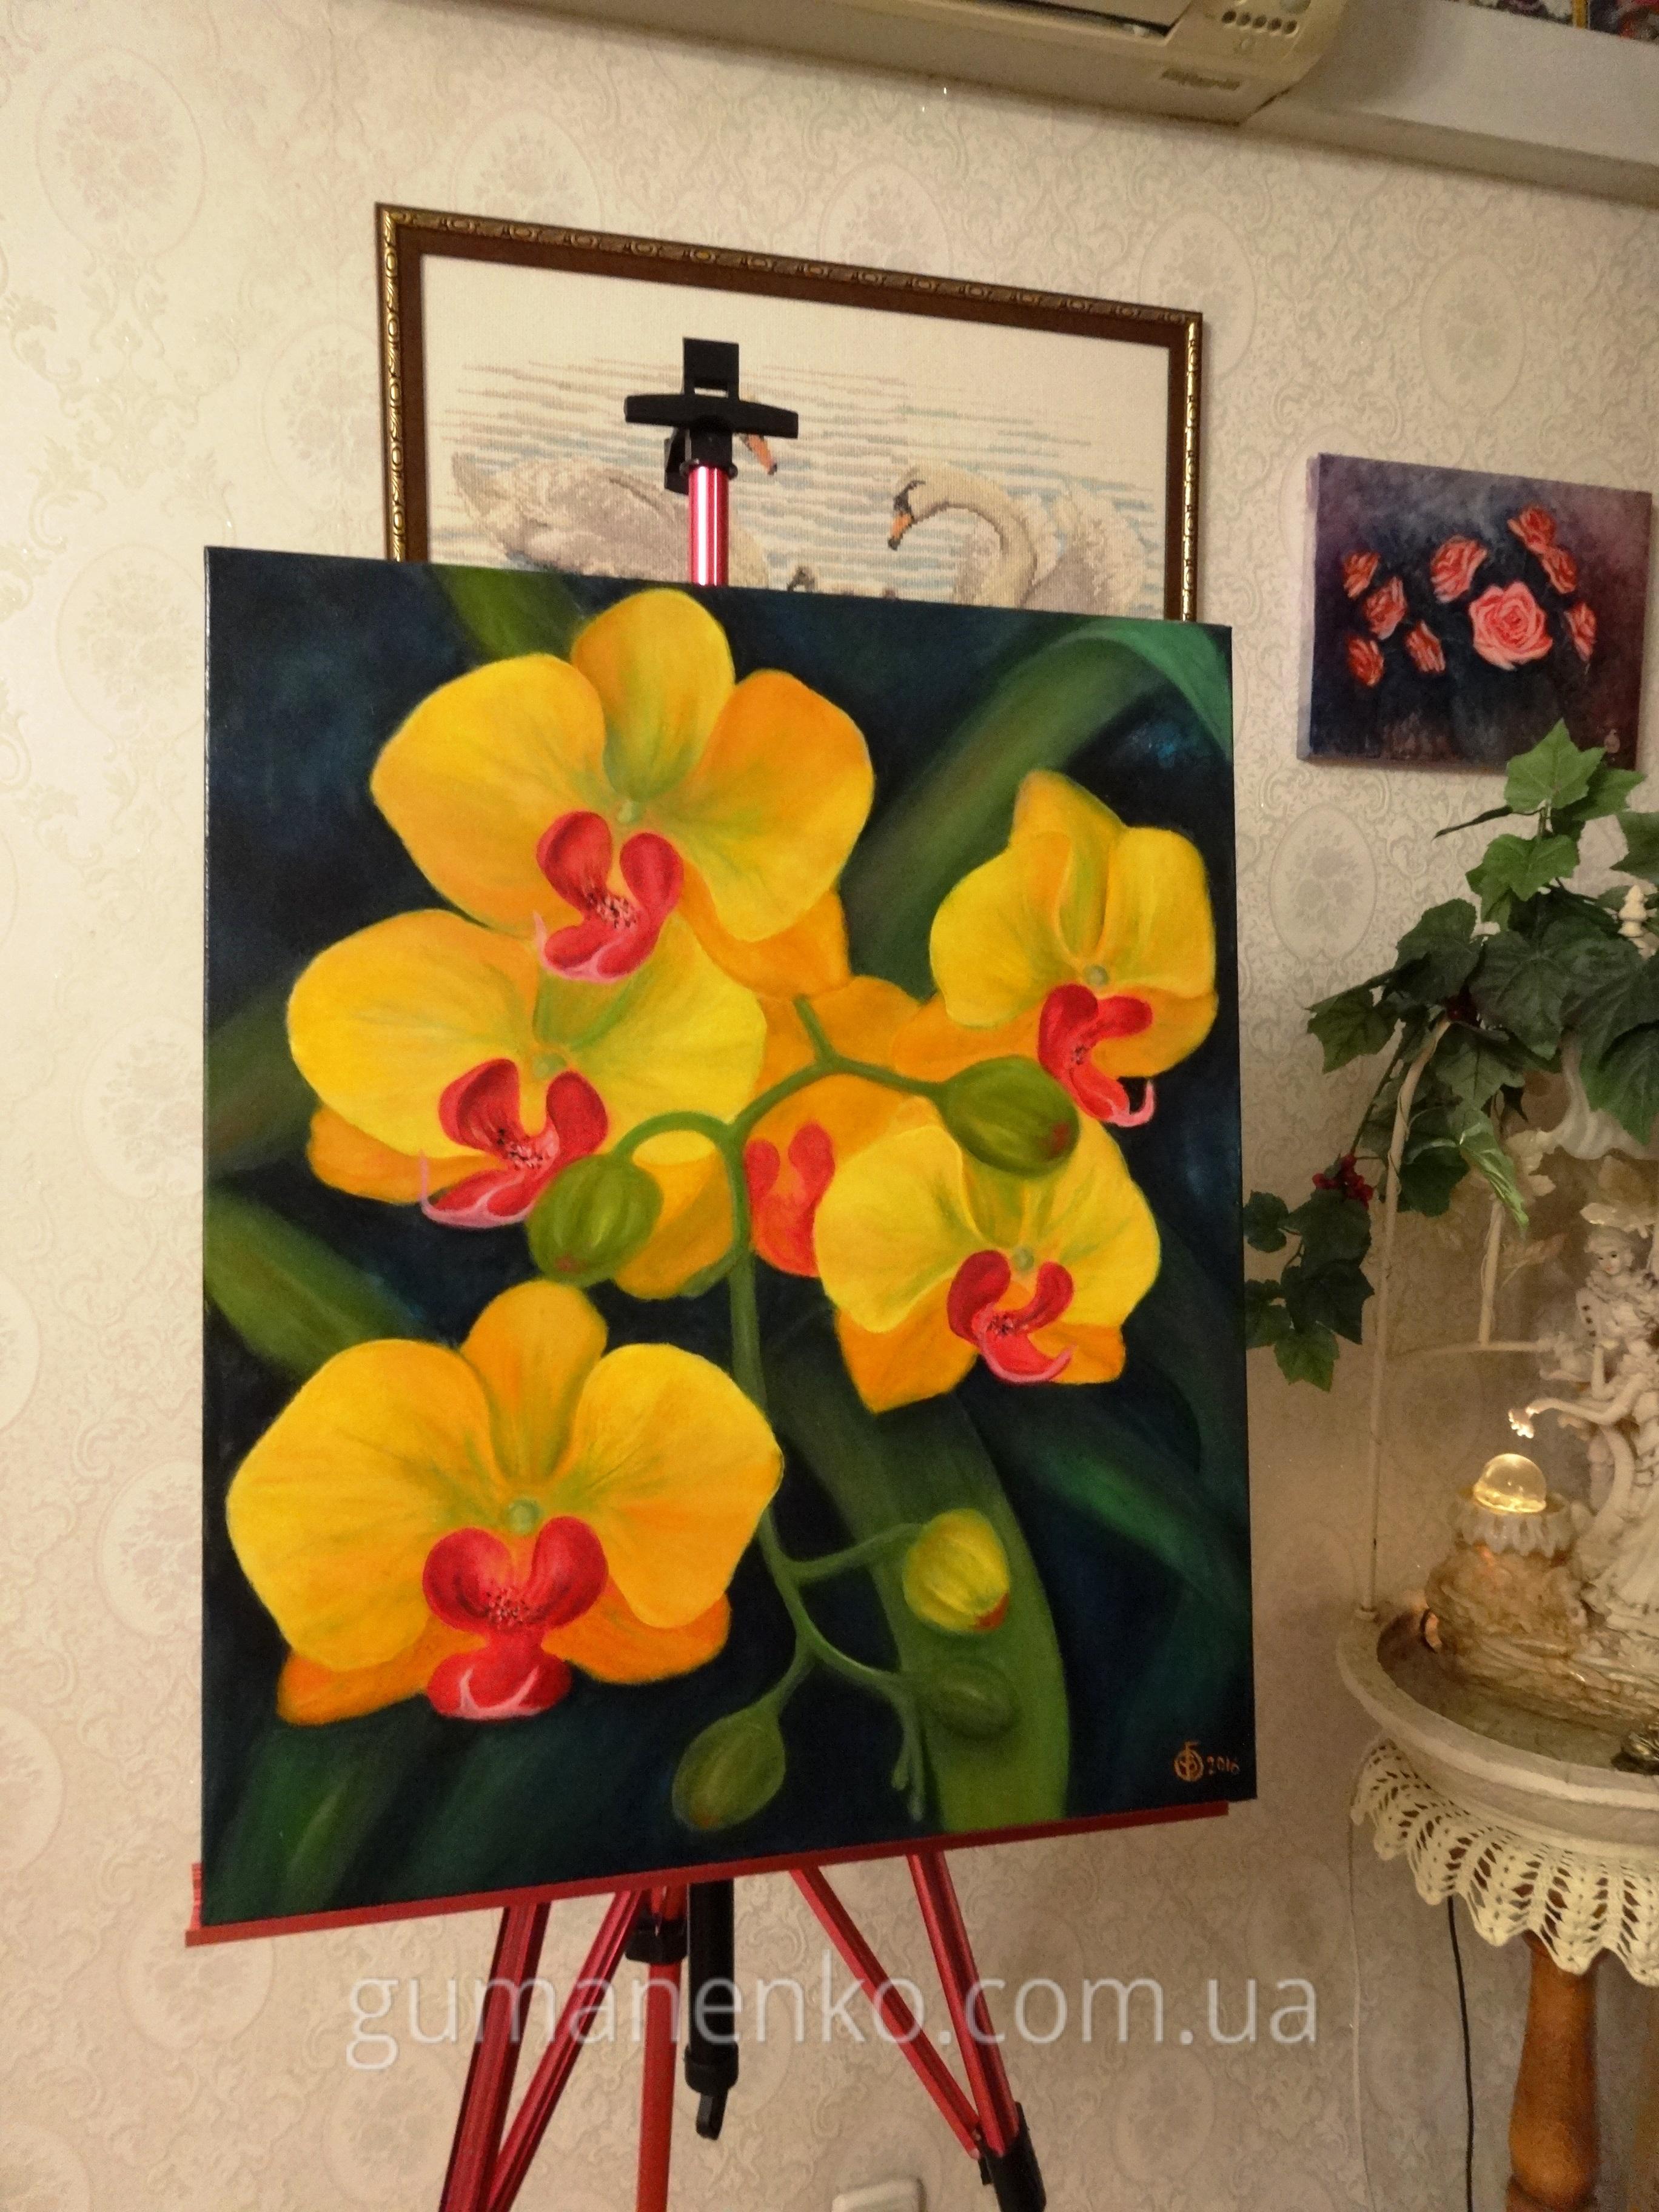 Орхидеи - маленькие солнышки холст 50х60 см., масло